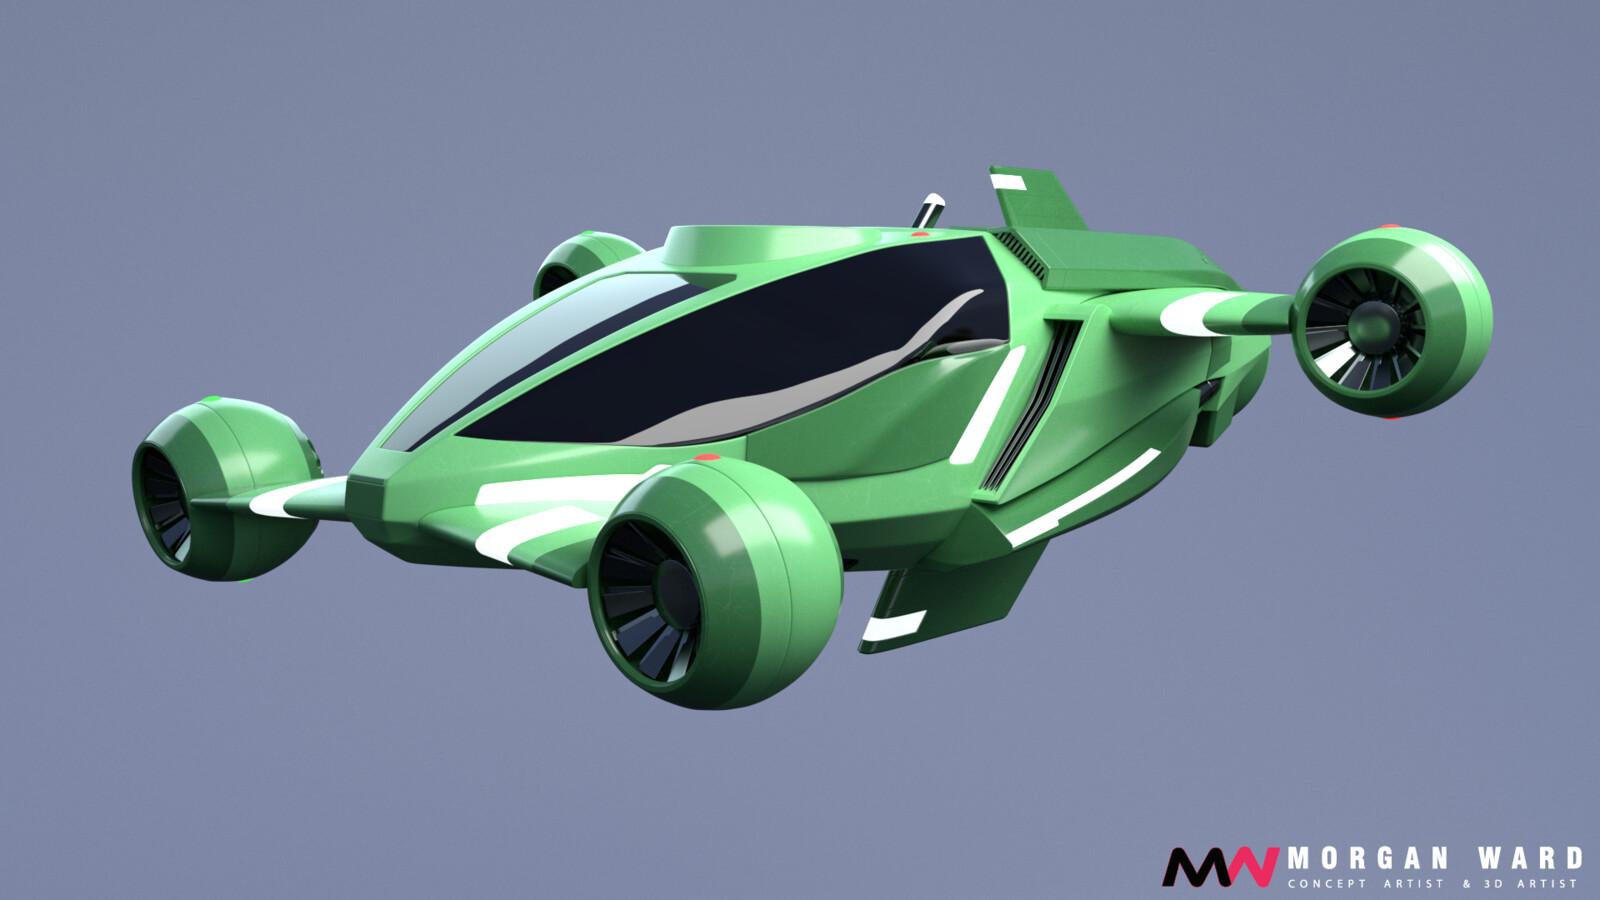 Original colors - green version